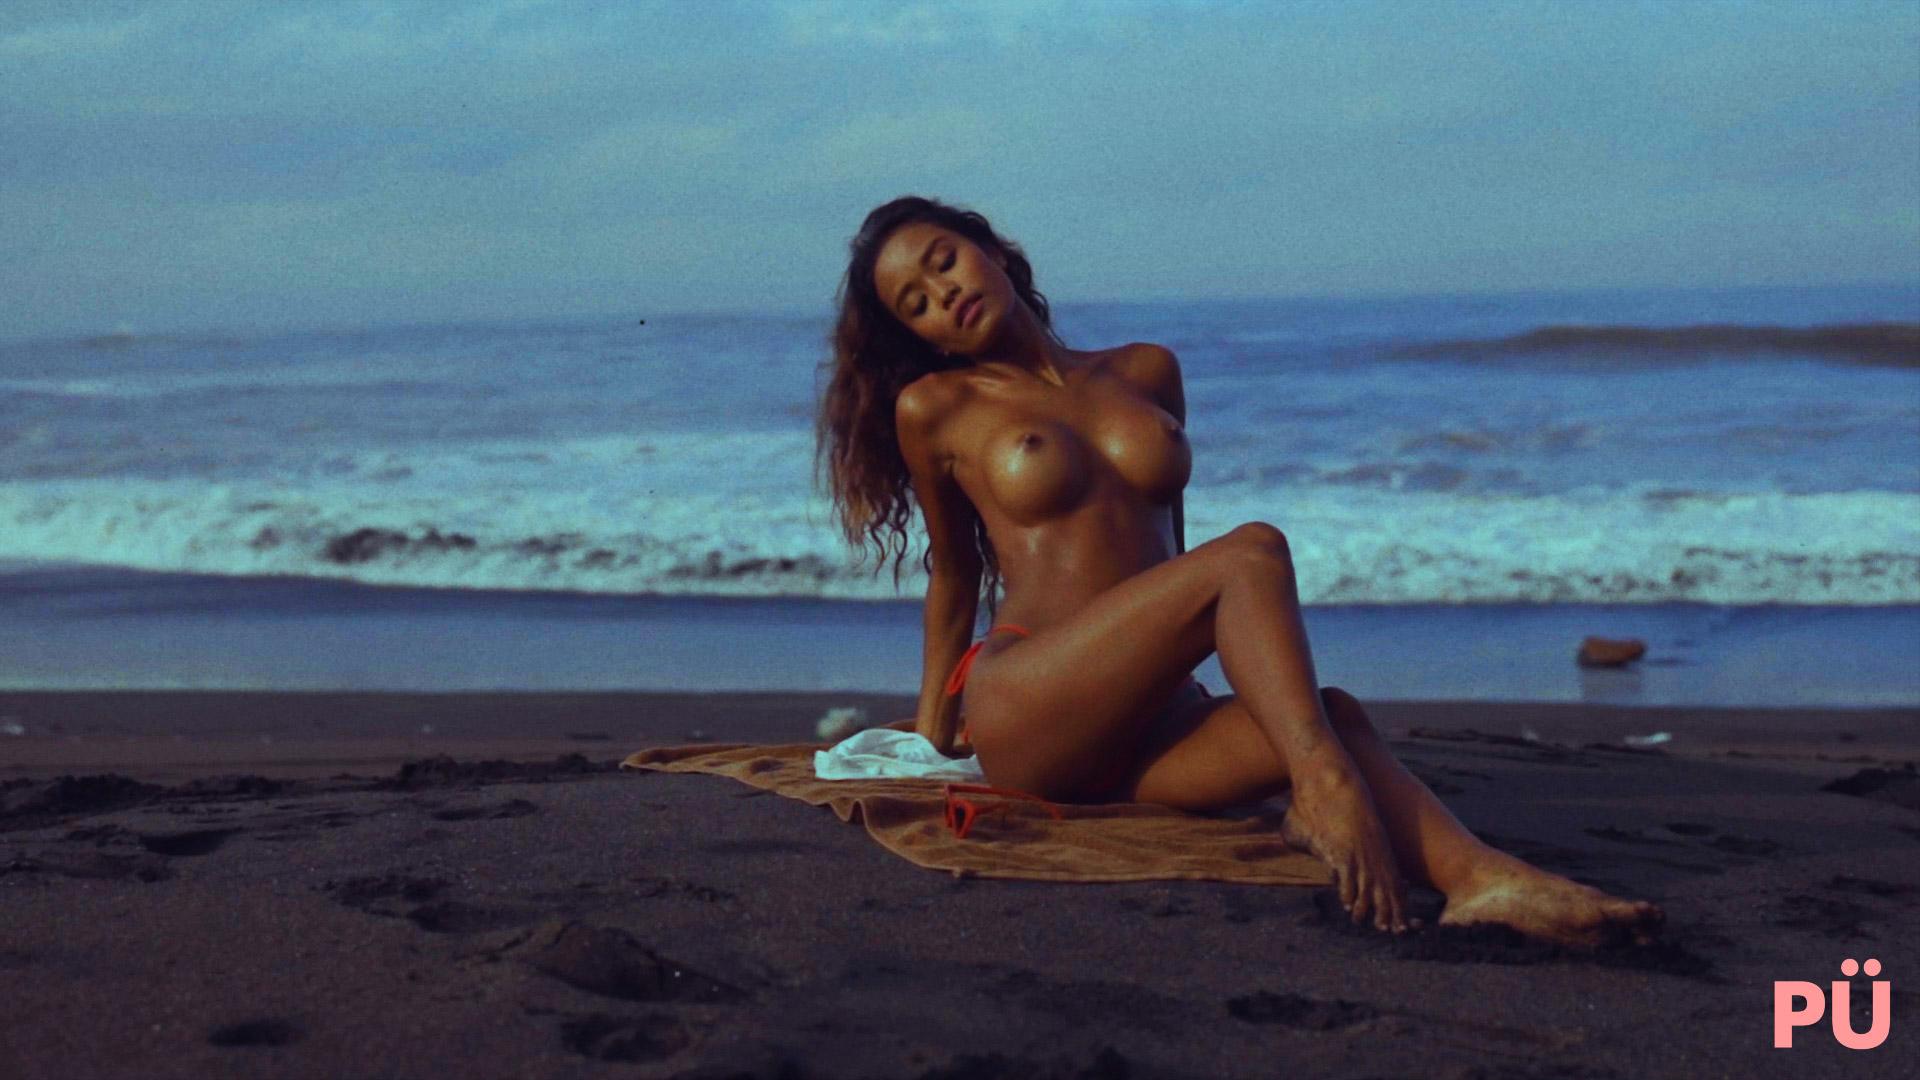 018-Black-Oilie-Sand.00_02_12_09.Still027.jpg